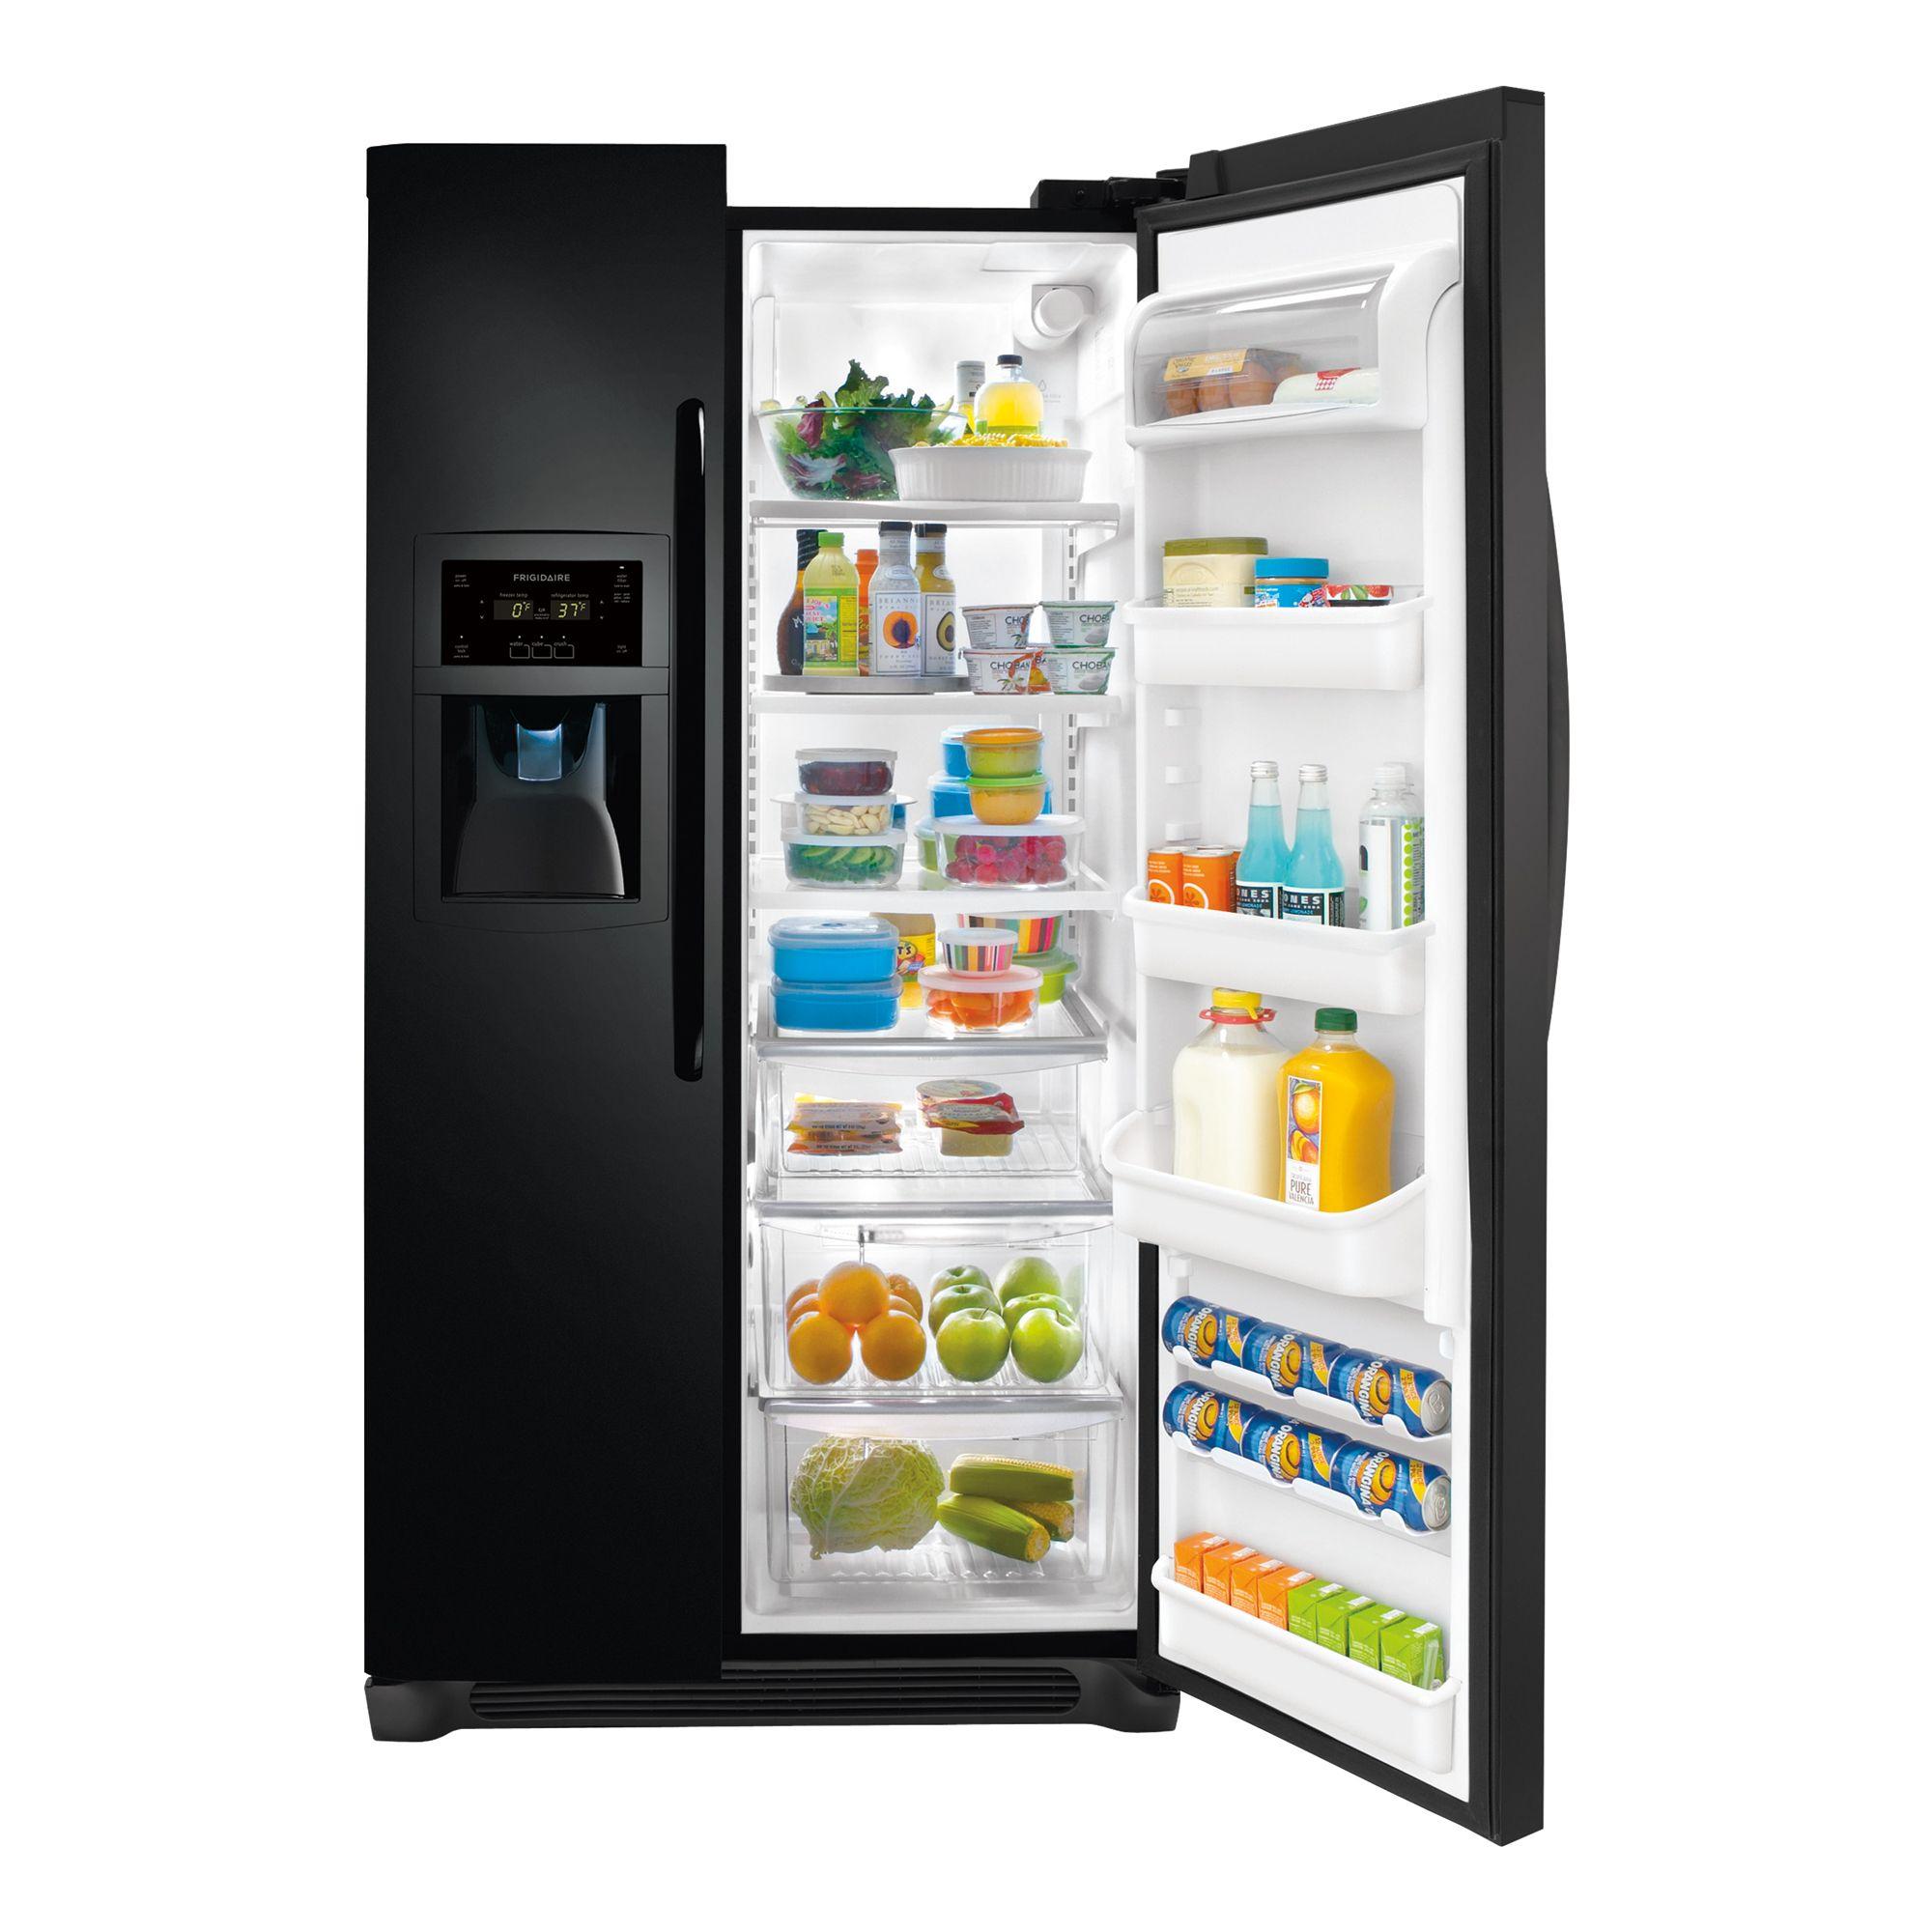 Frigidaire FFSC2323LE 22.6 cu. ft. Counter-Depth Side-by-Side Refrigerator